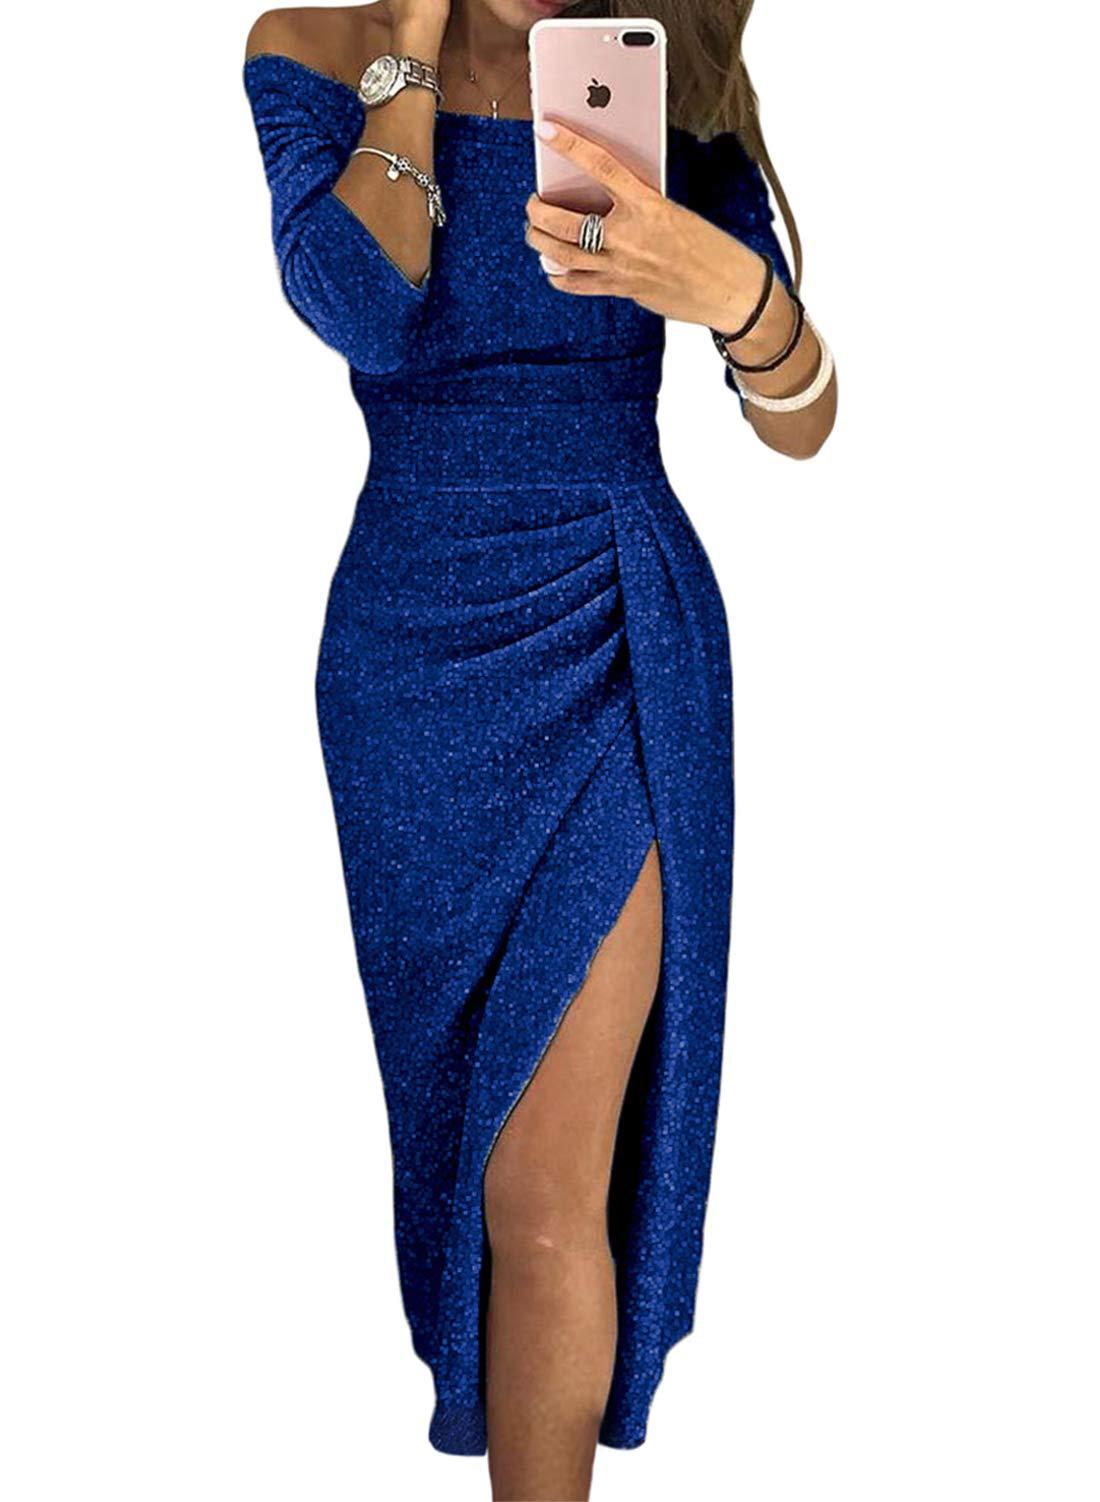 Womens Party Bodycon Midi Dress Off Shoulder Split Sparkly Shiny Ruched Elegant Cocktail Pencil Dress Blue M